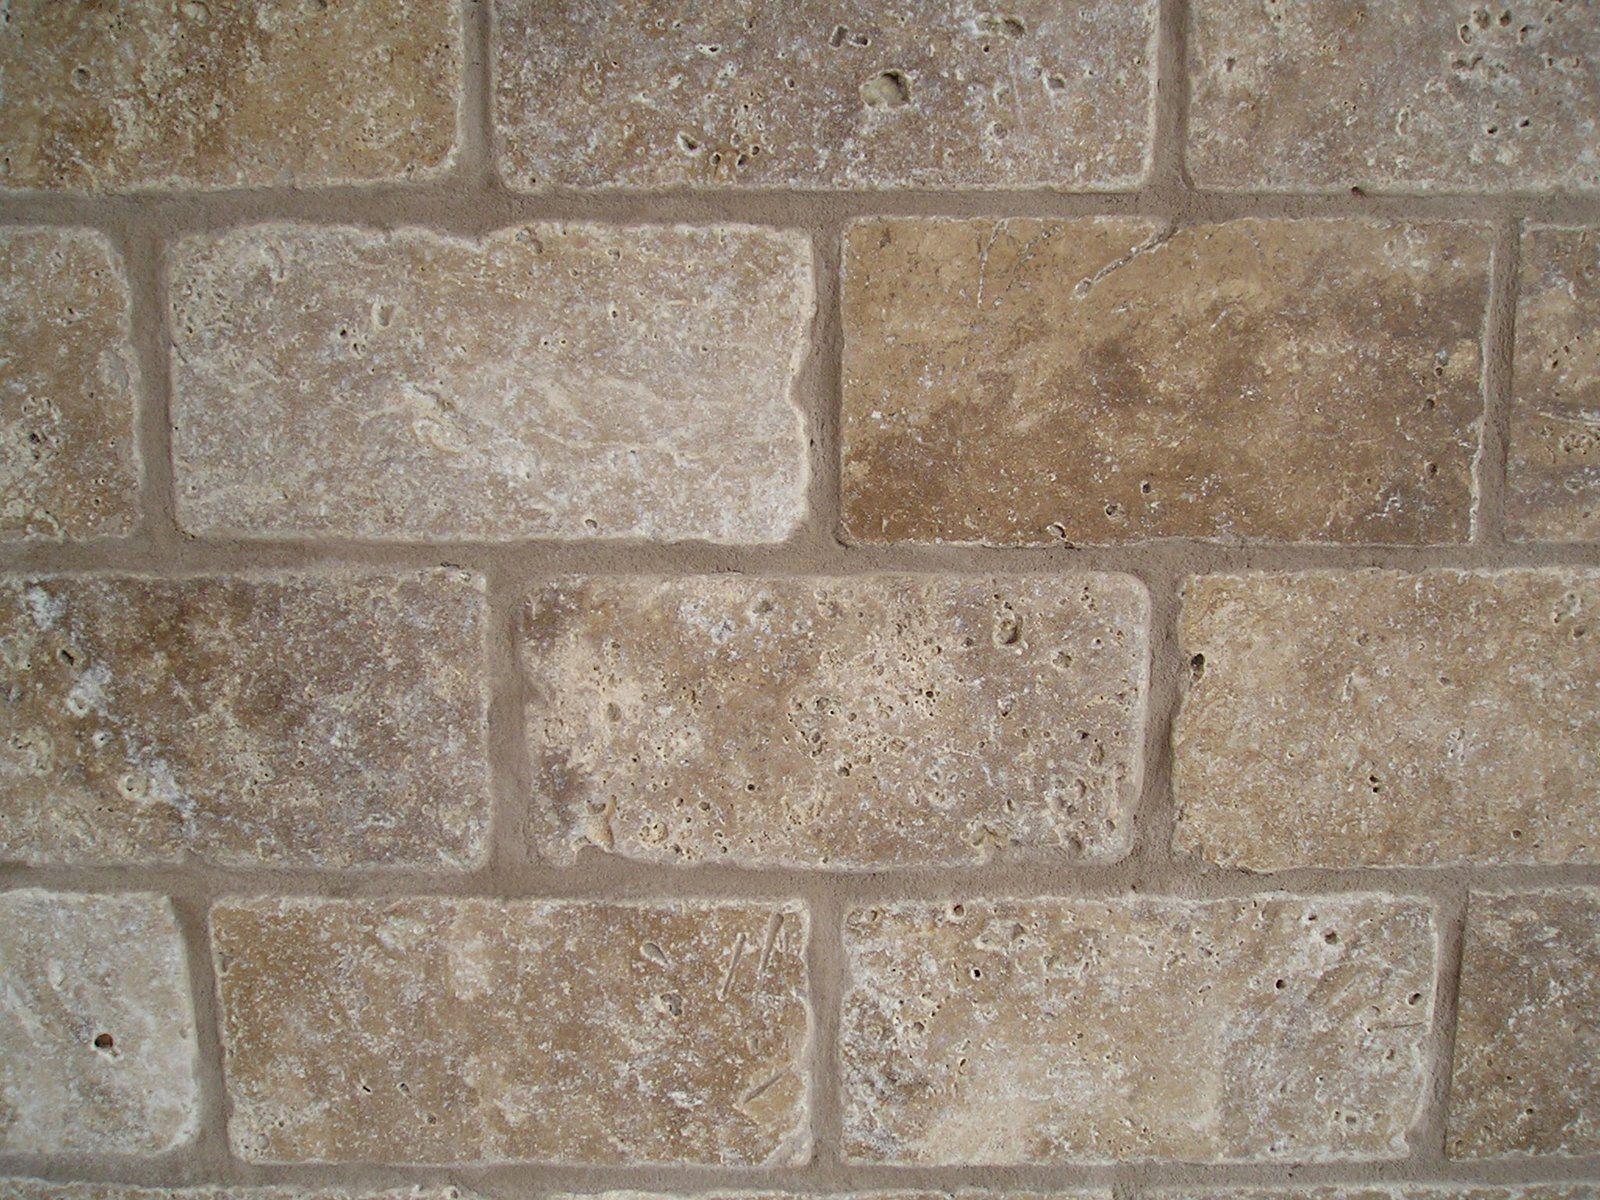 Kitchen backsplash travertine tile - Find This Pin And More On Kitchen Makeover Art Walnut Travertine Backsplash